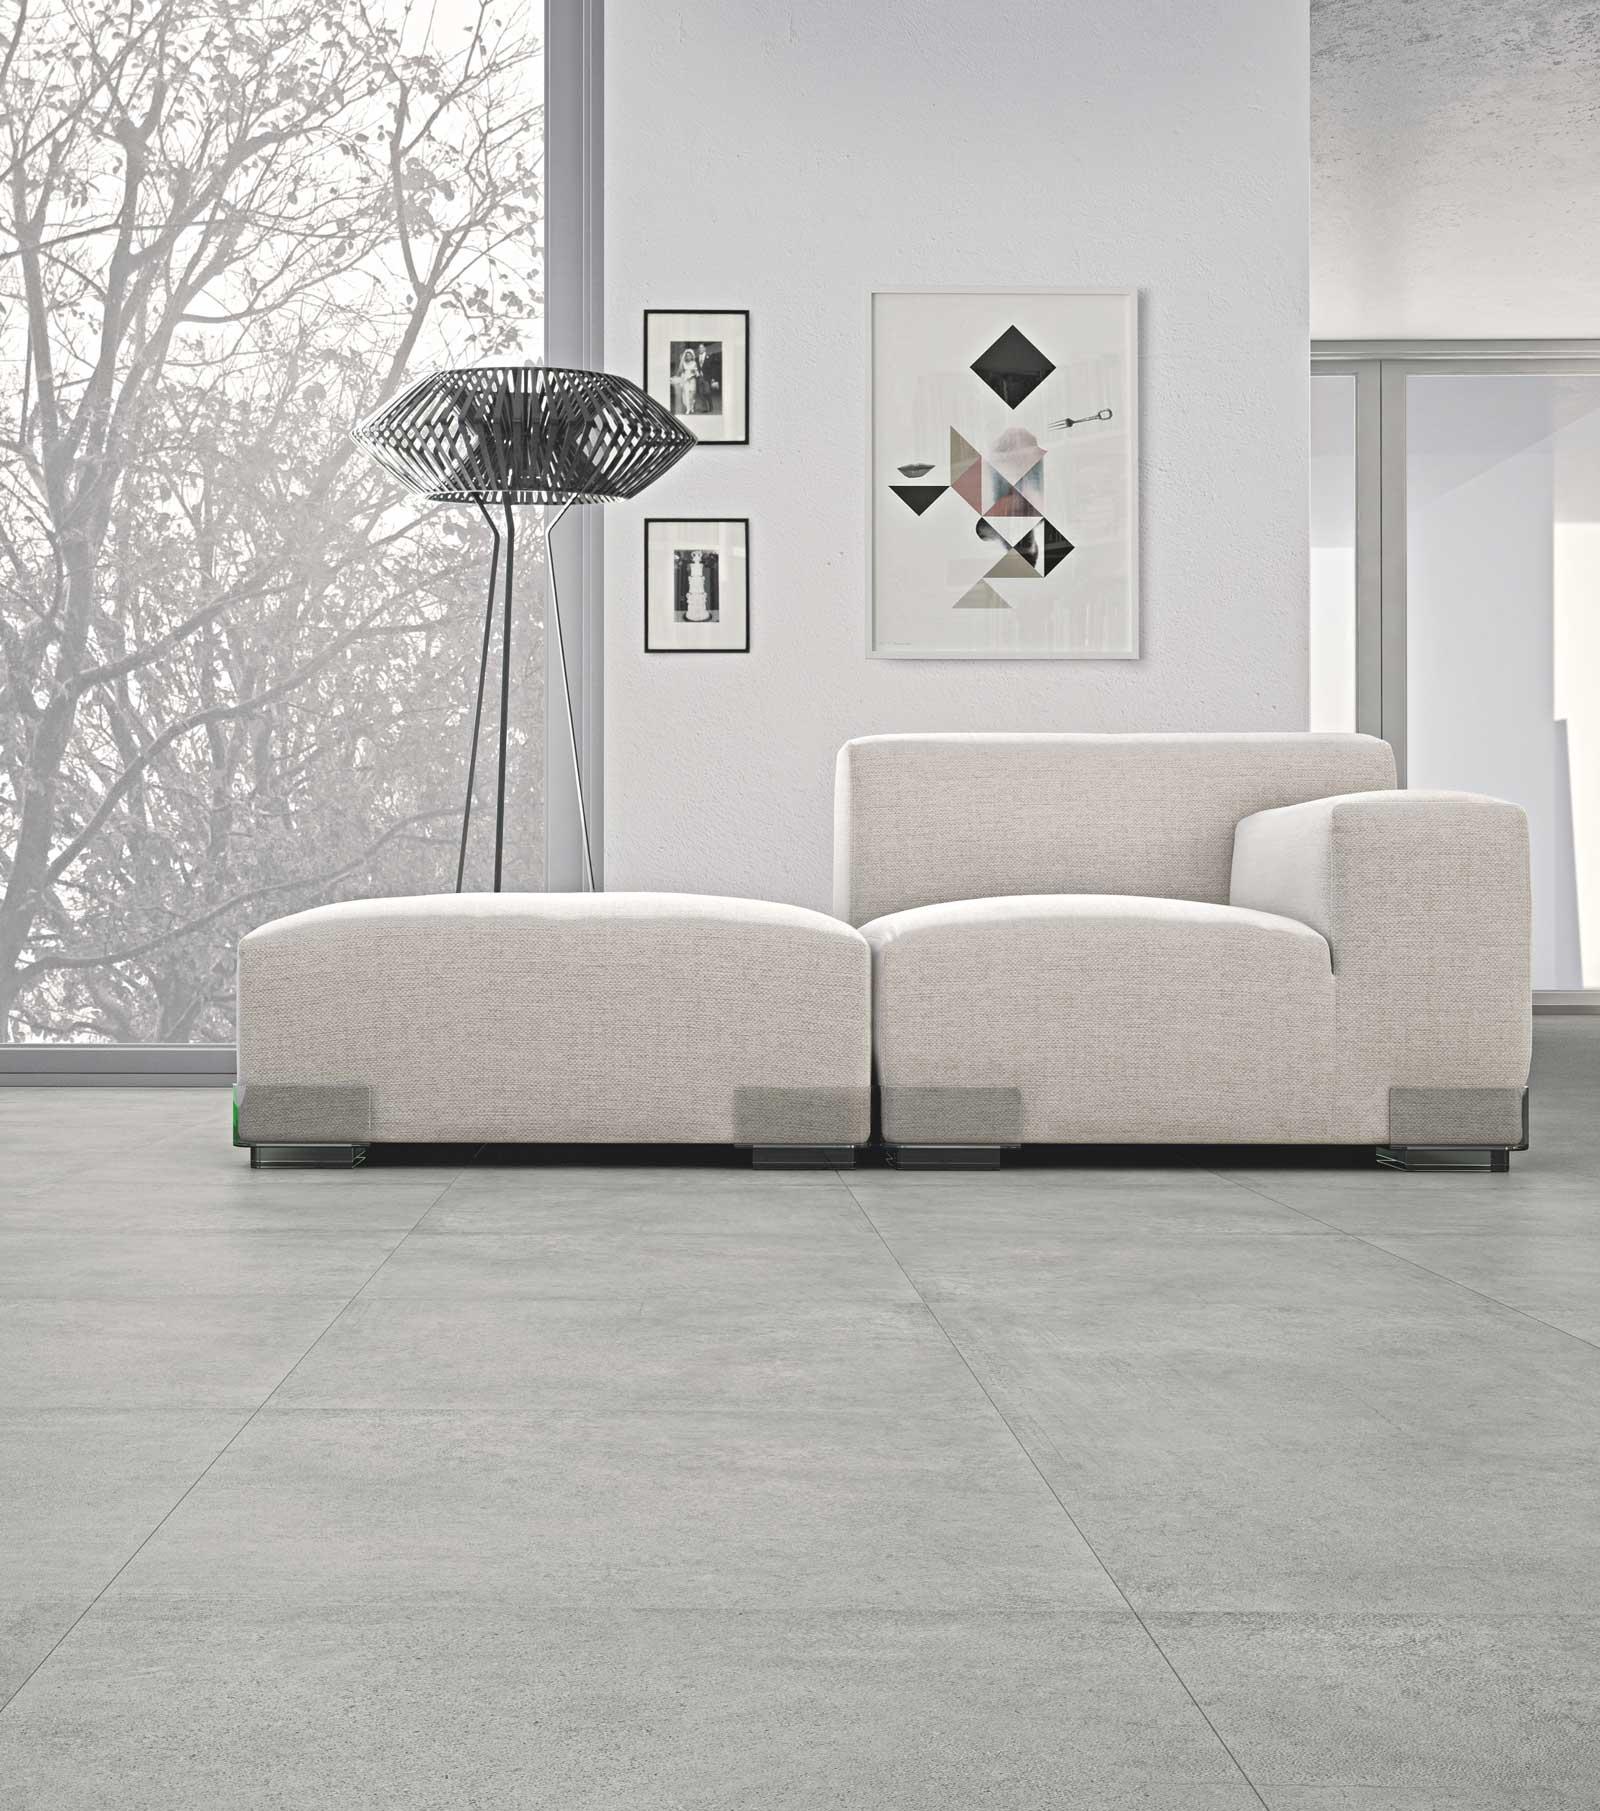 cemento - inspiration gallery